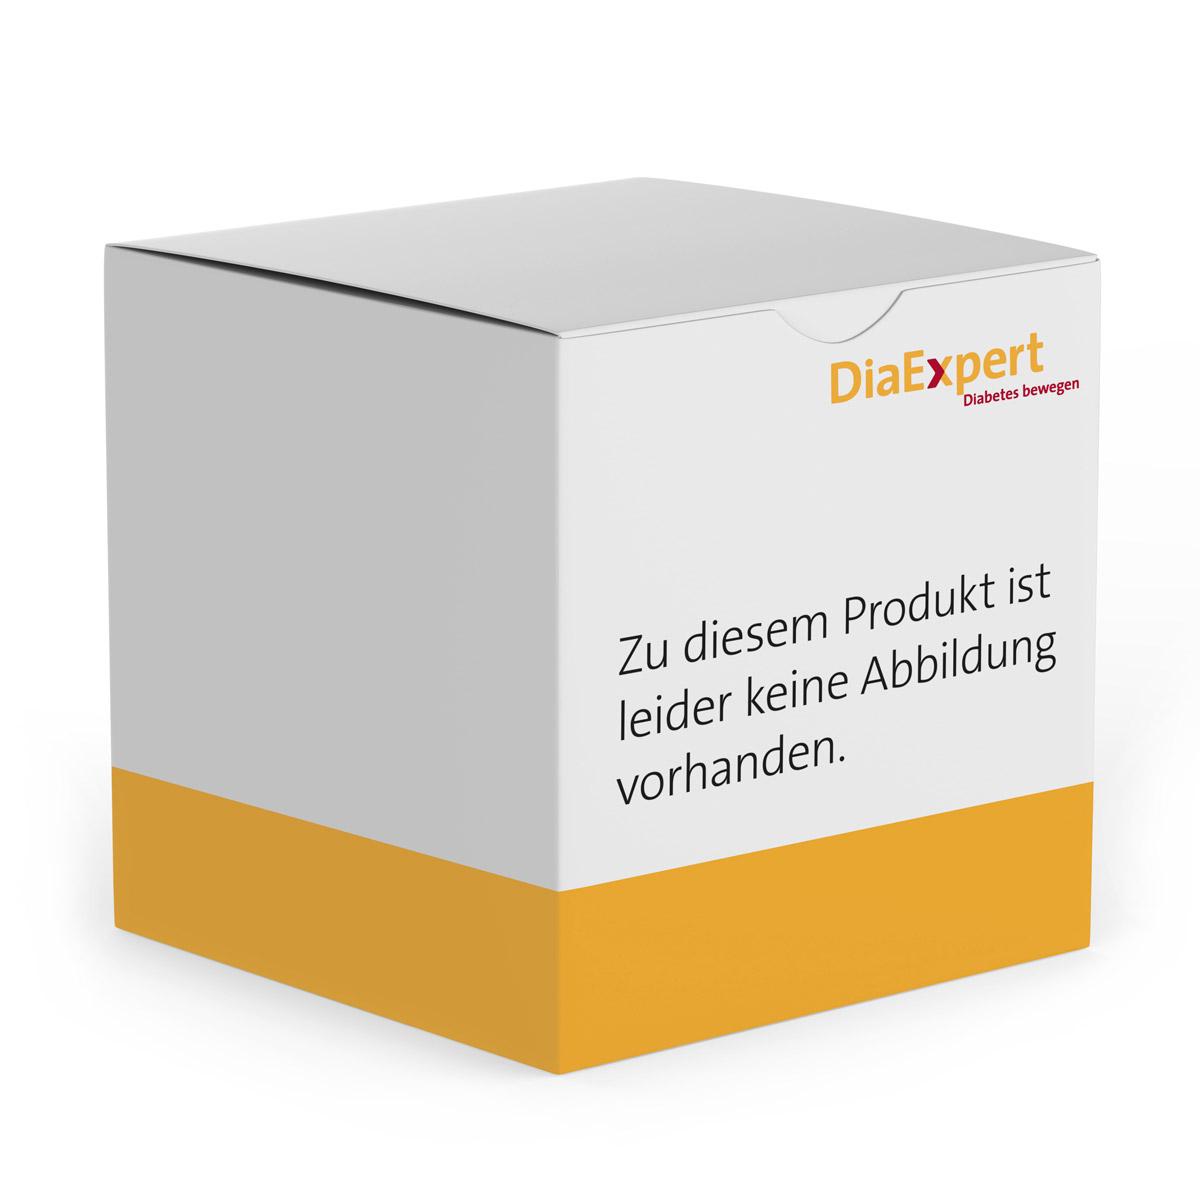 diaexpert neopren tasche mit rei verschlu pink minimed 5 er serie insulinpumpen zubeh r. Black Bedroom Furniture Sets. Home Design Ideas